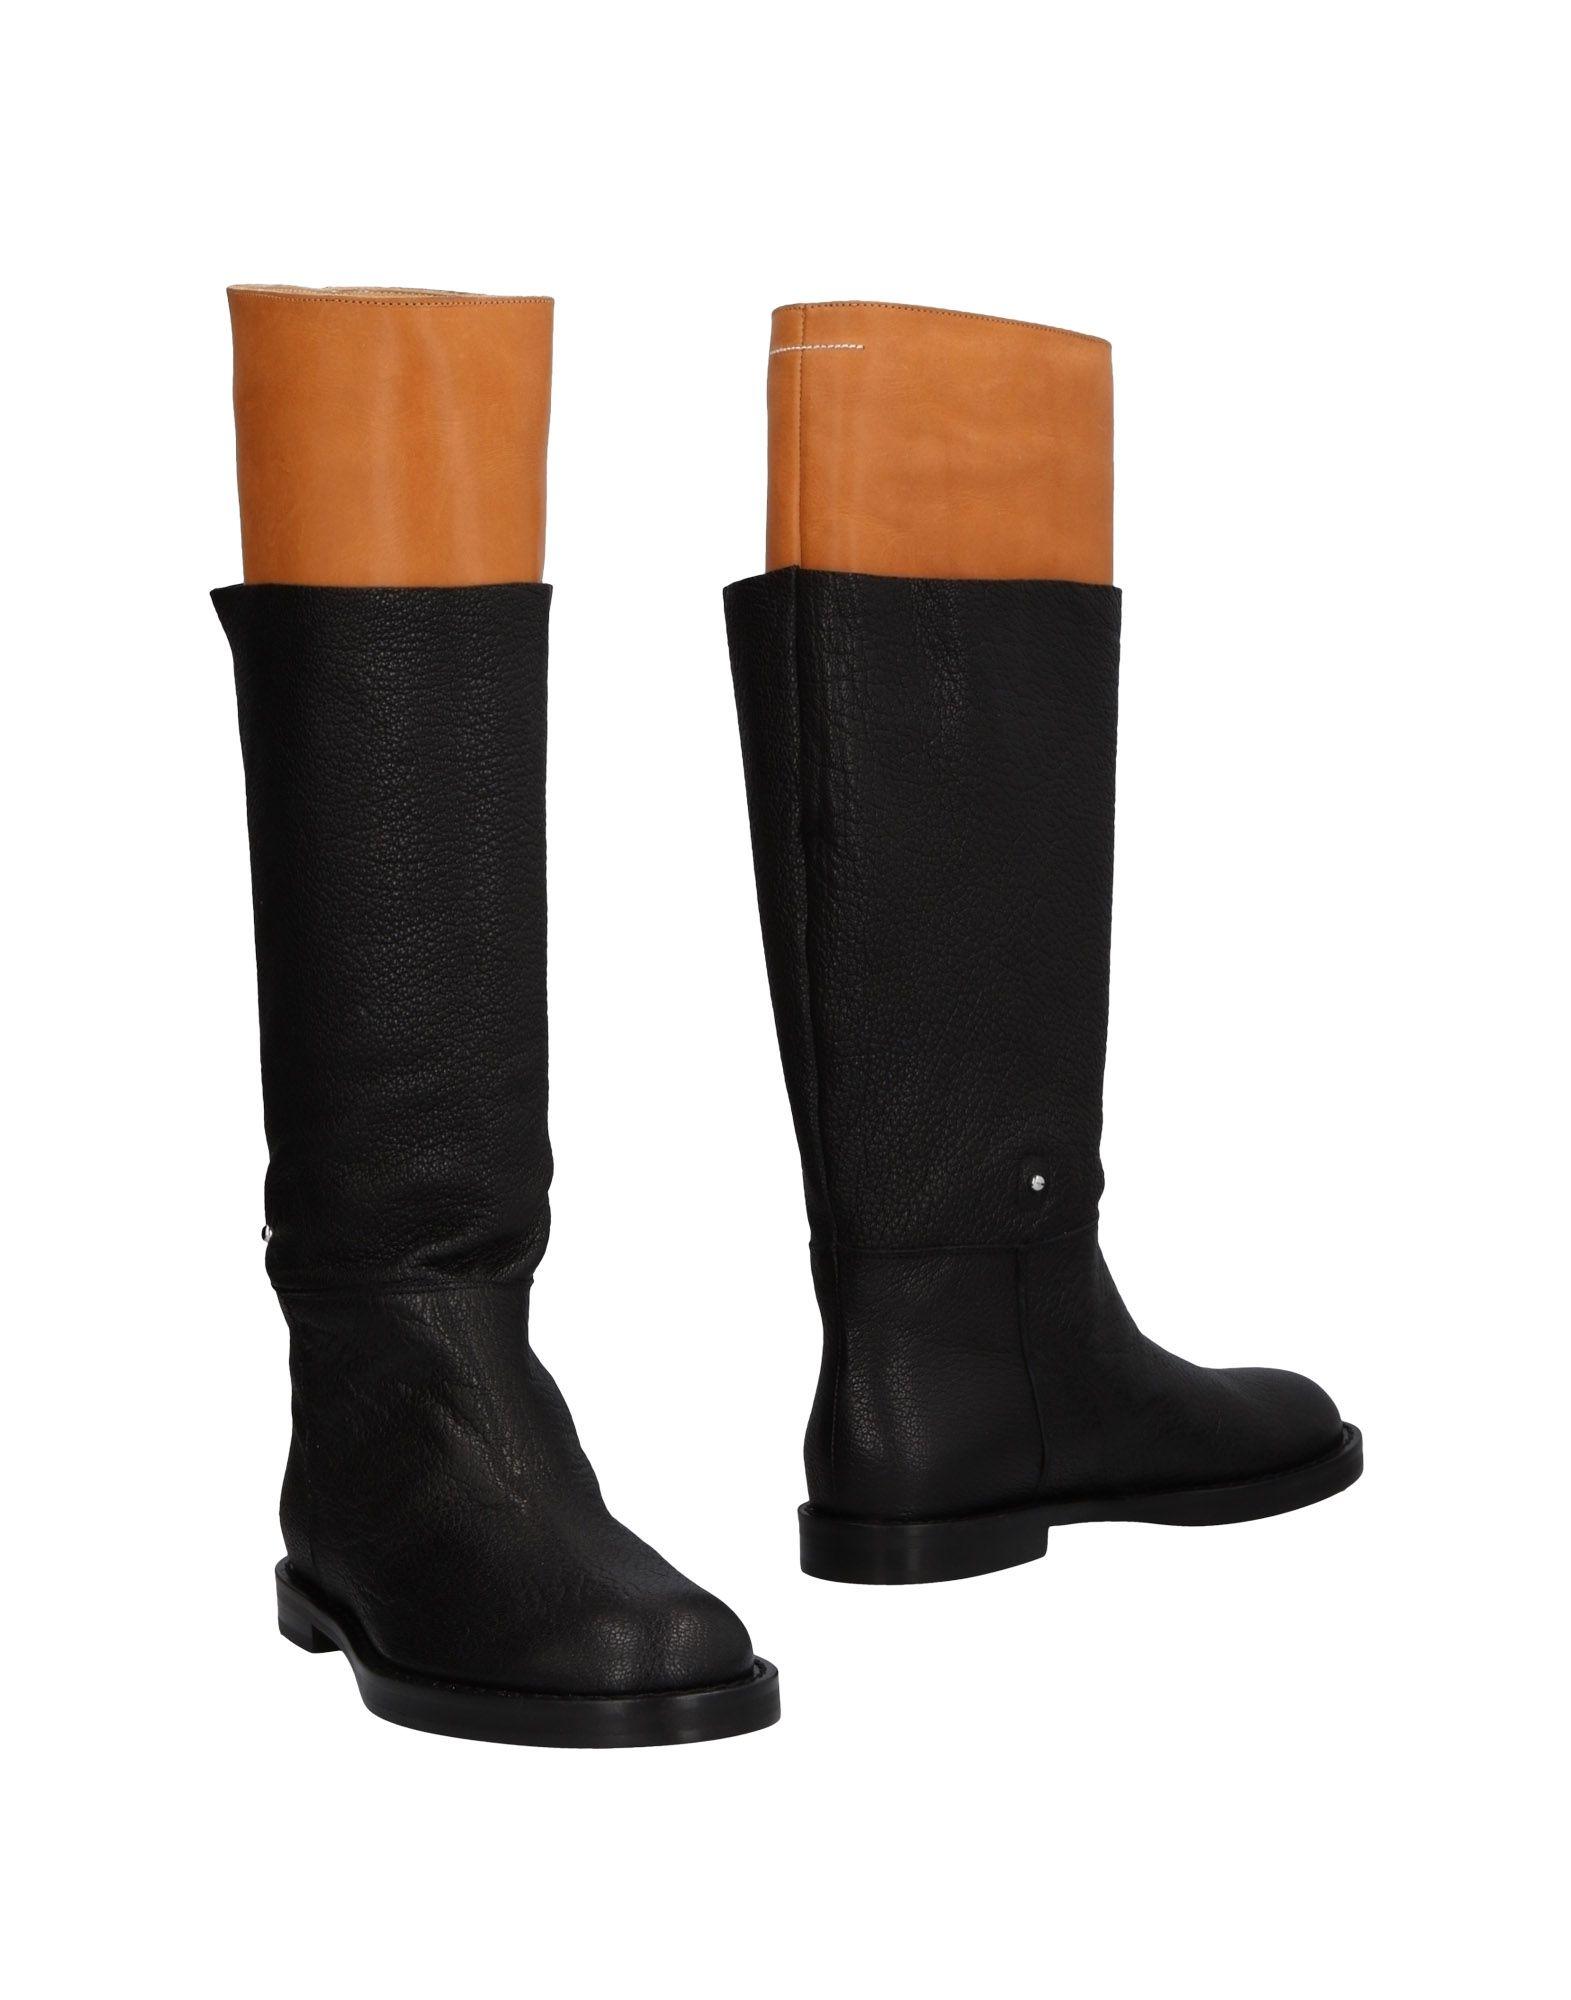 Mm6 Maison Margiela Boots - Women Mm6 Maison Margiela Margiela Margiela Boots online on  United Kingdom - 11469337GX 276e5f